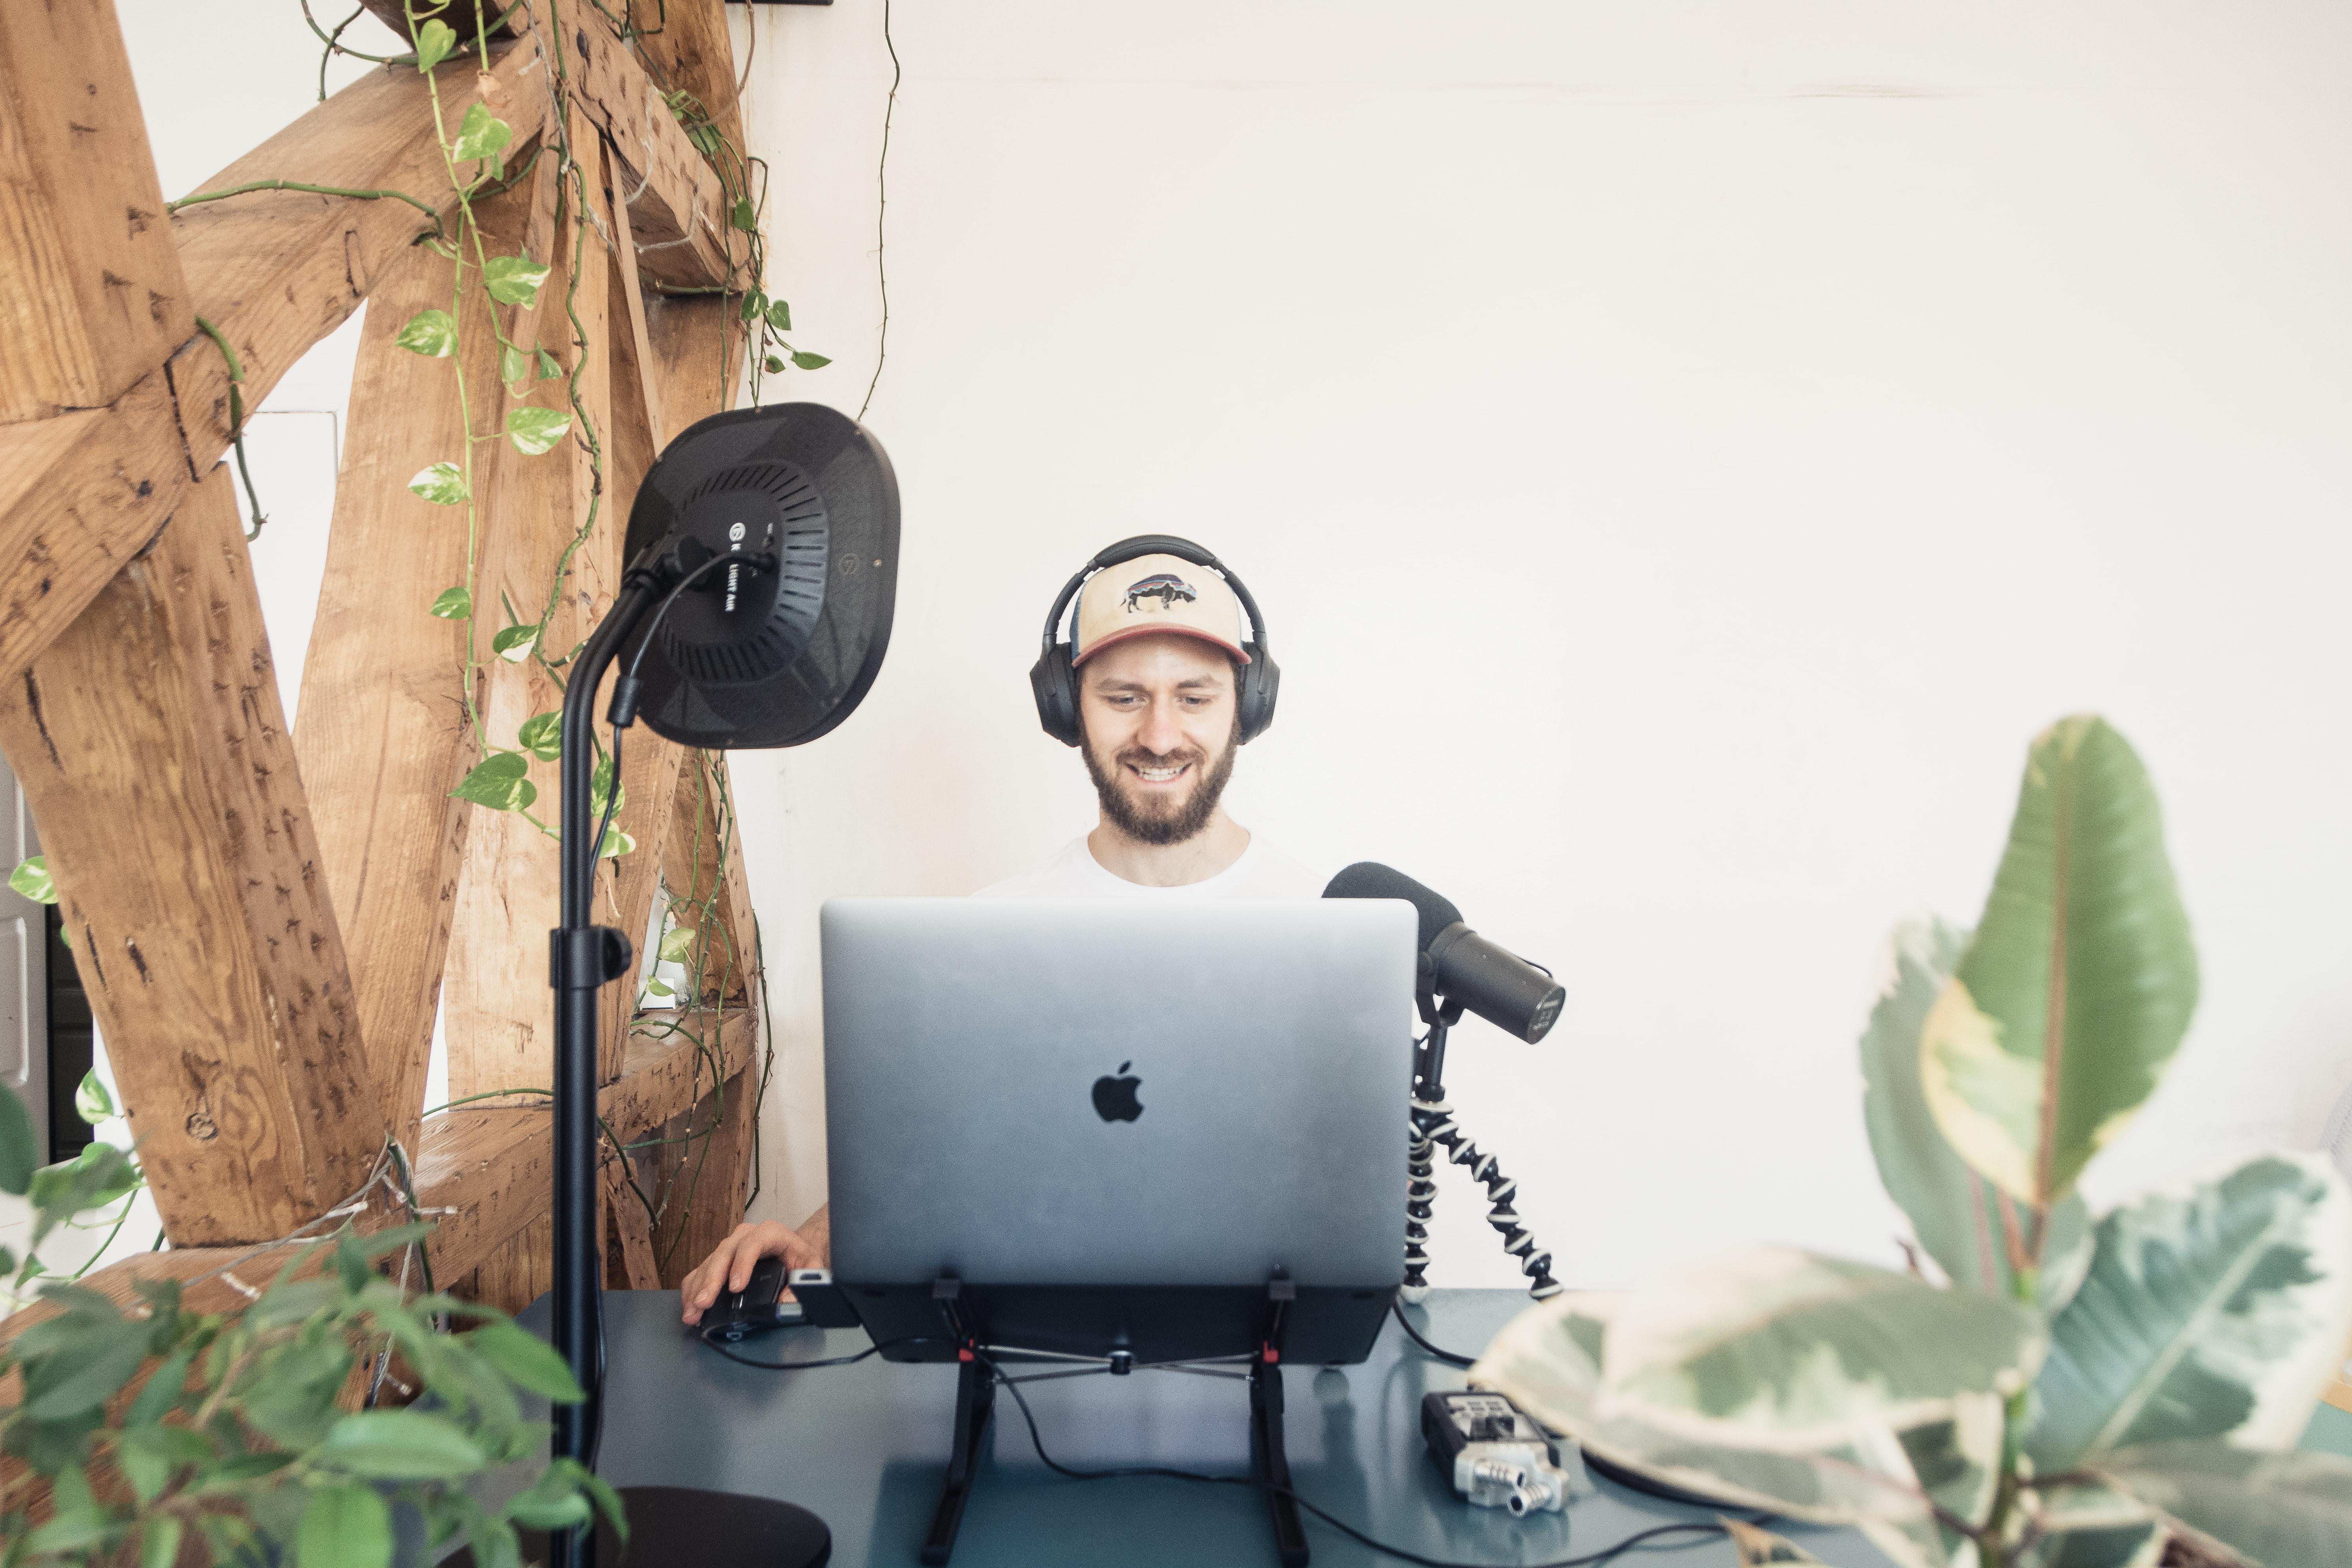 man-at-desk-with-mic-headphones-light-computer